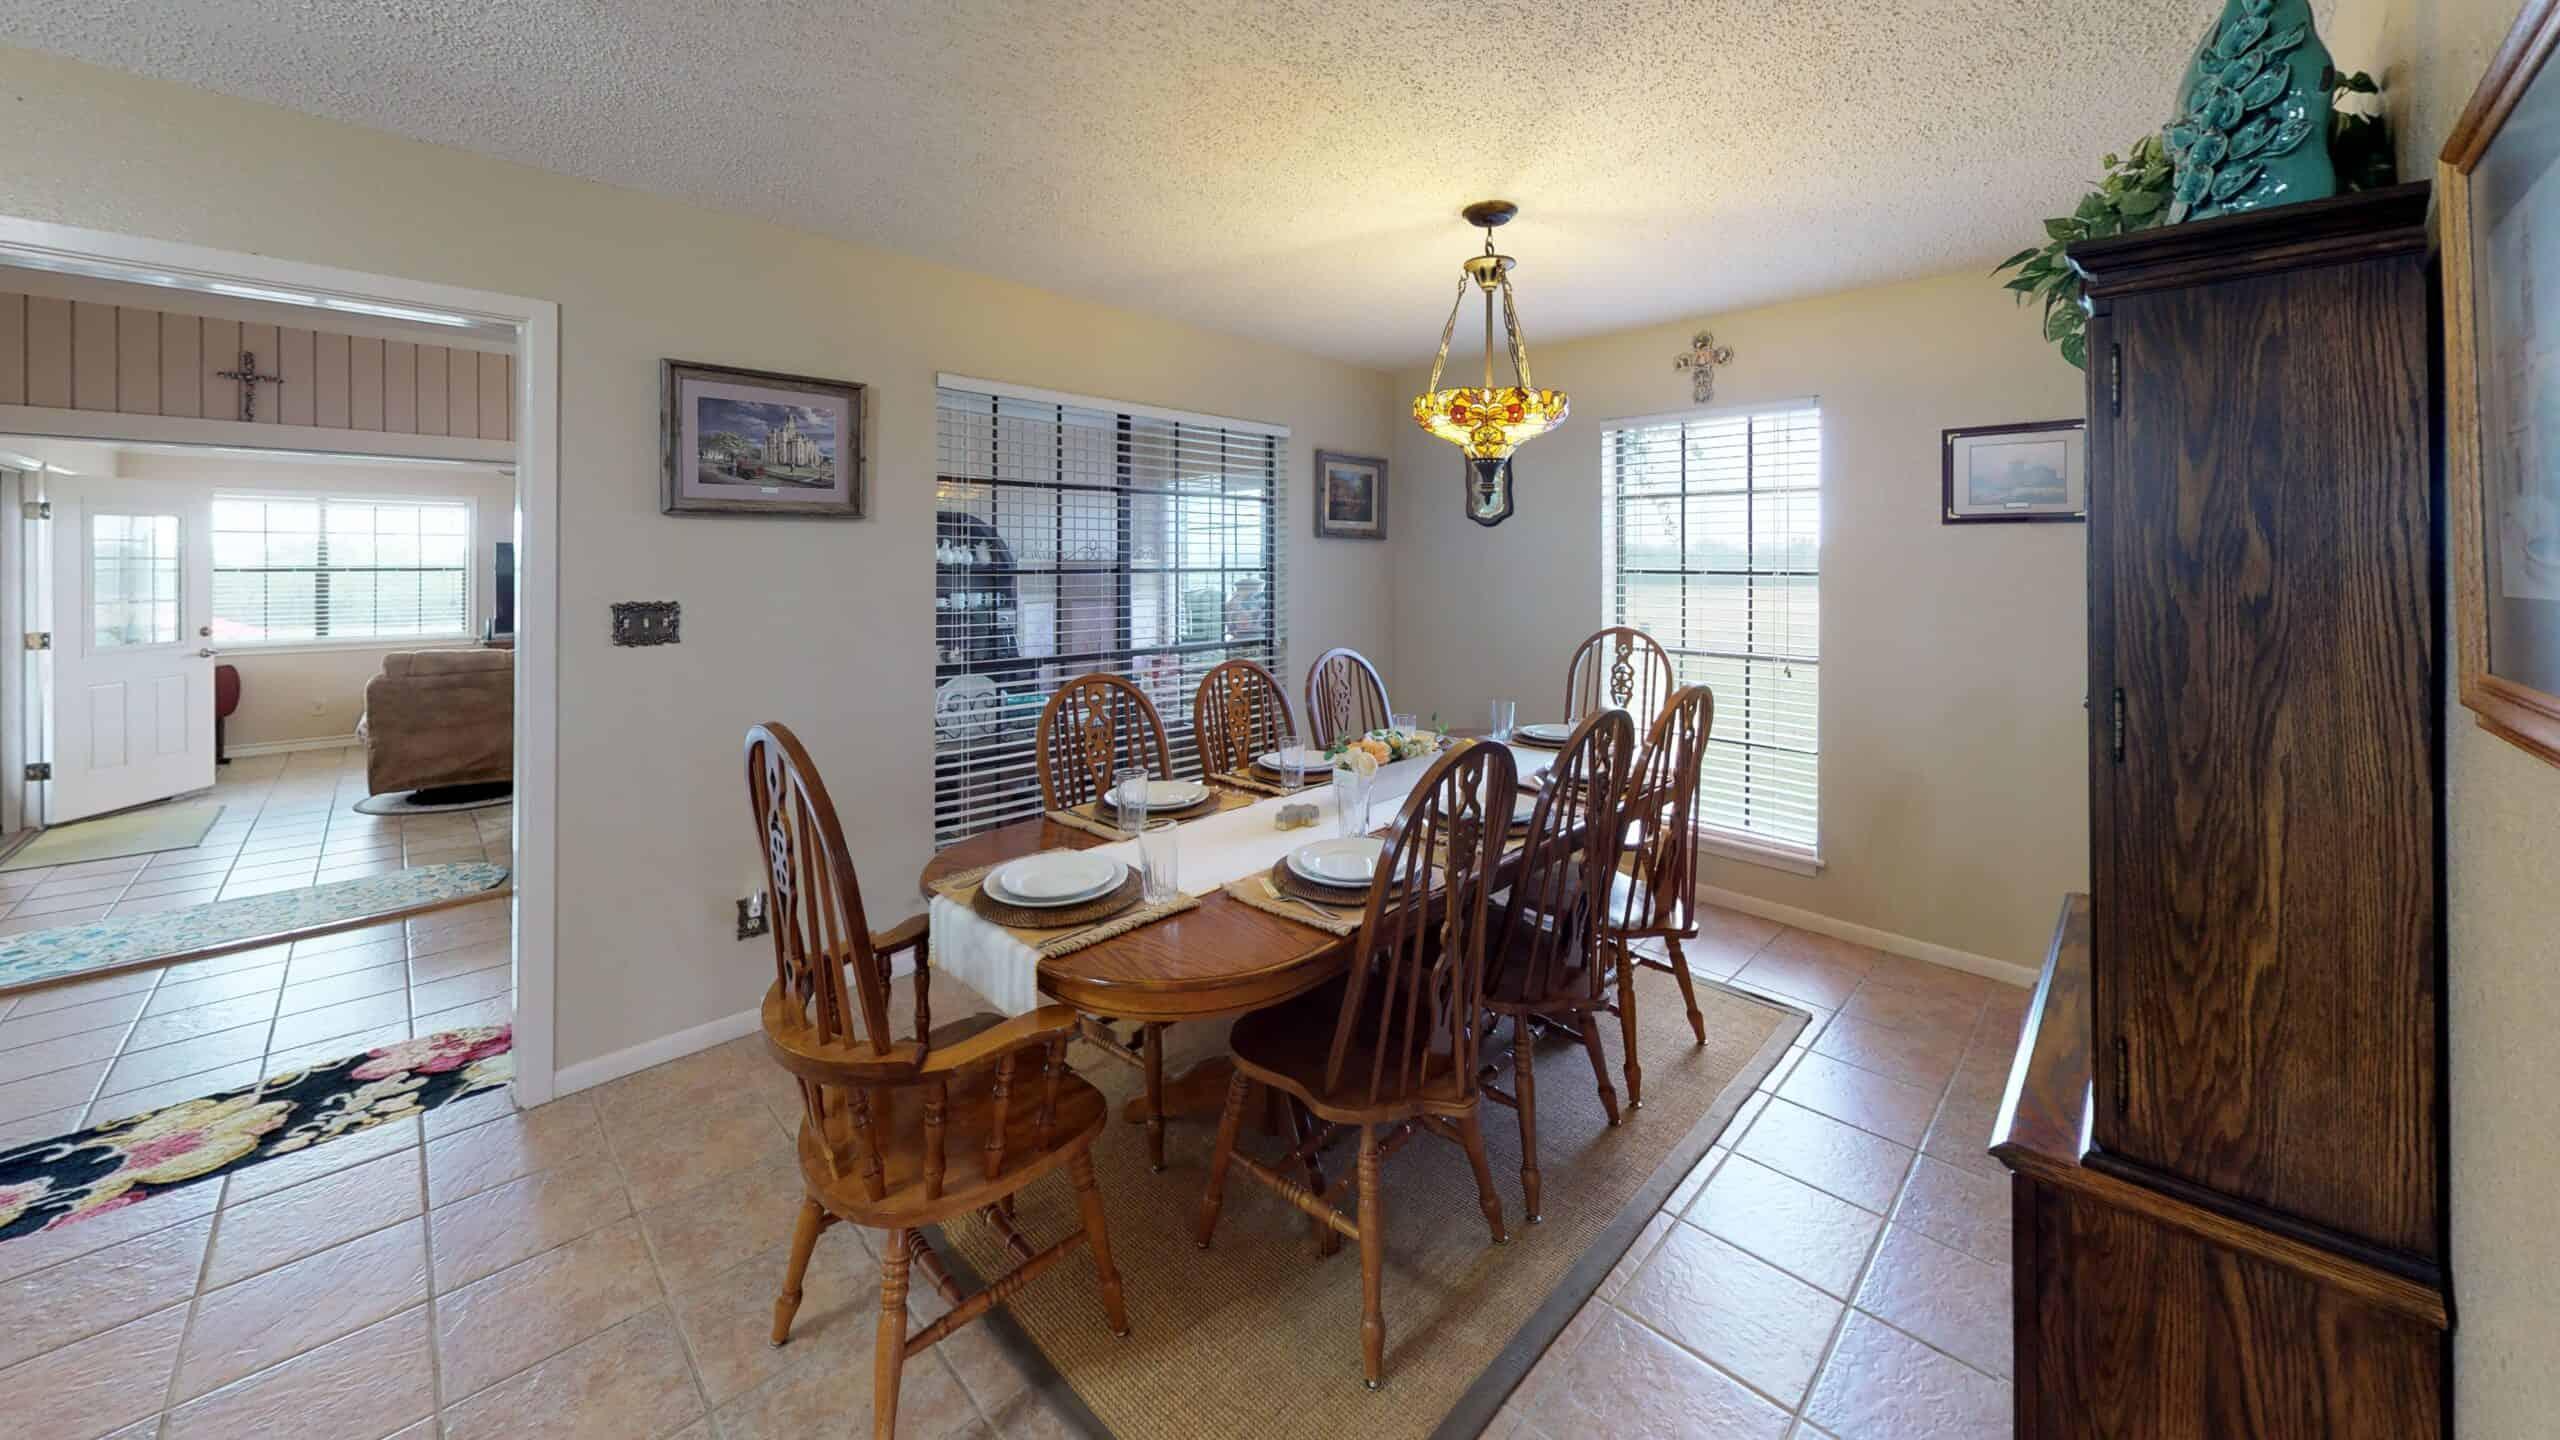 9645-FM-1726-Goliad-TX-77963-Dining-Room